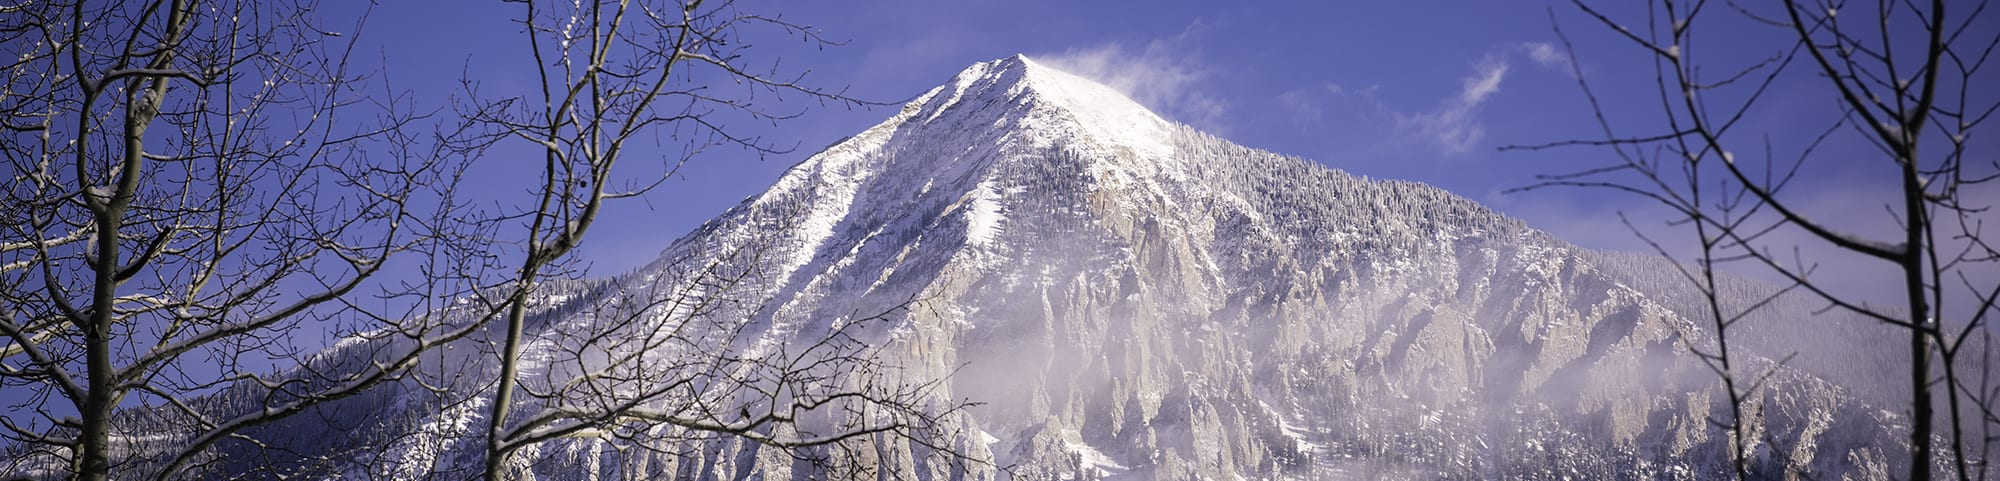 Mt. Crested Butte Colorado